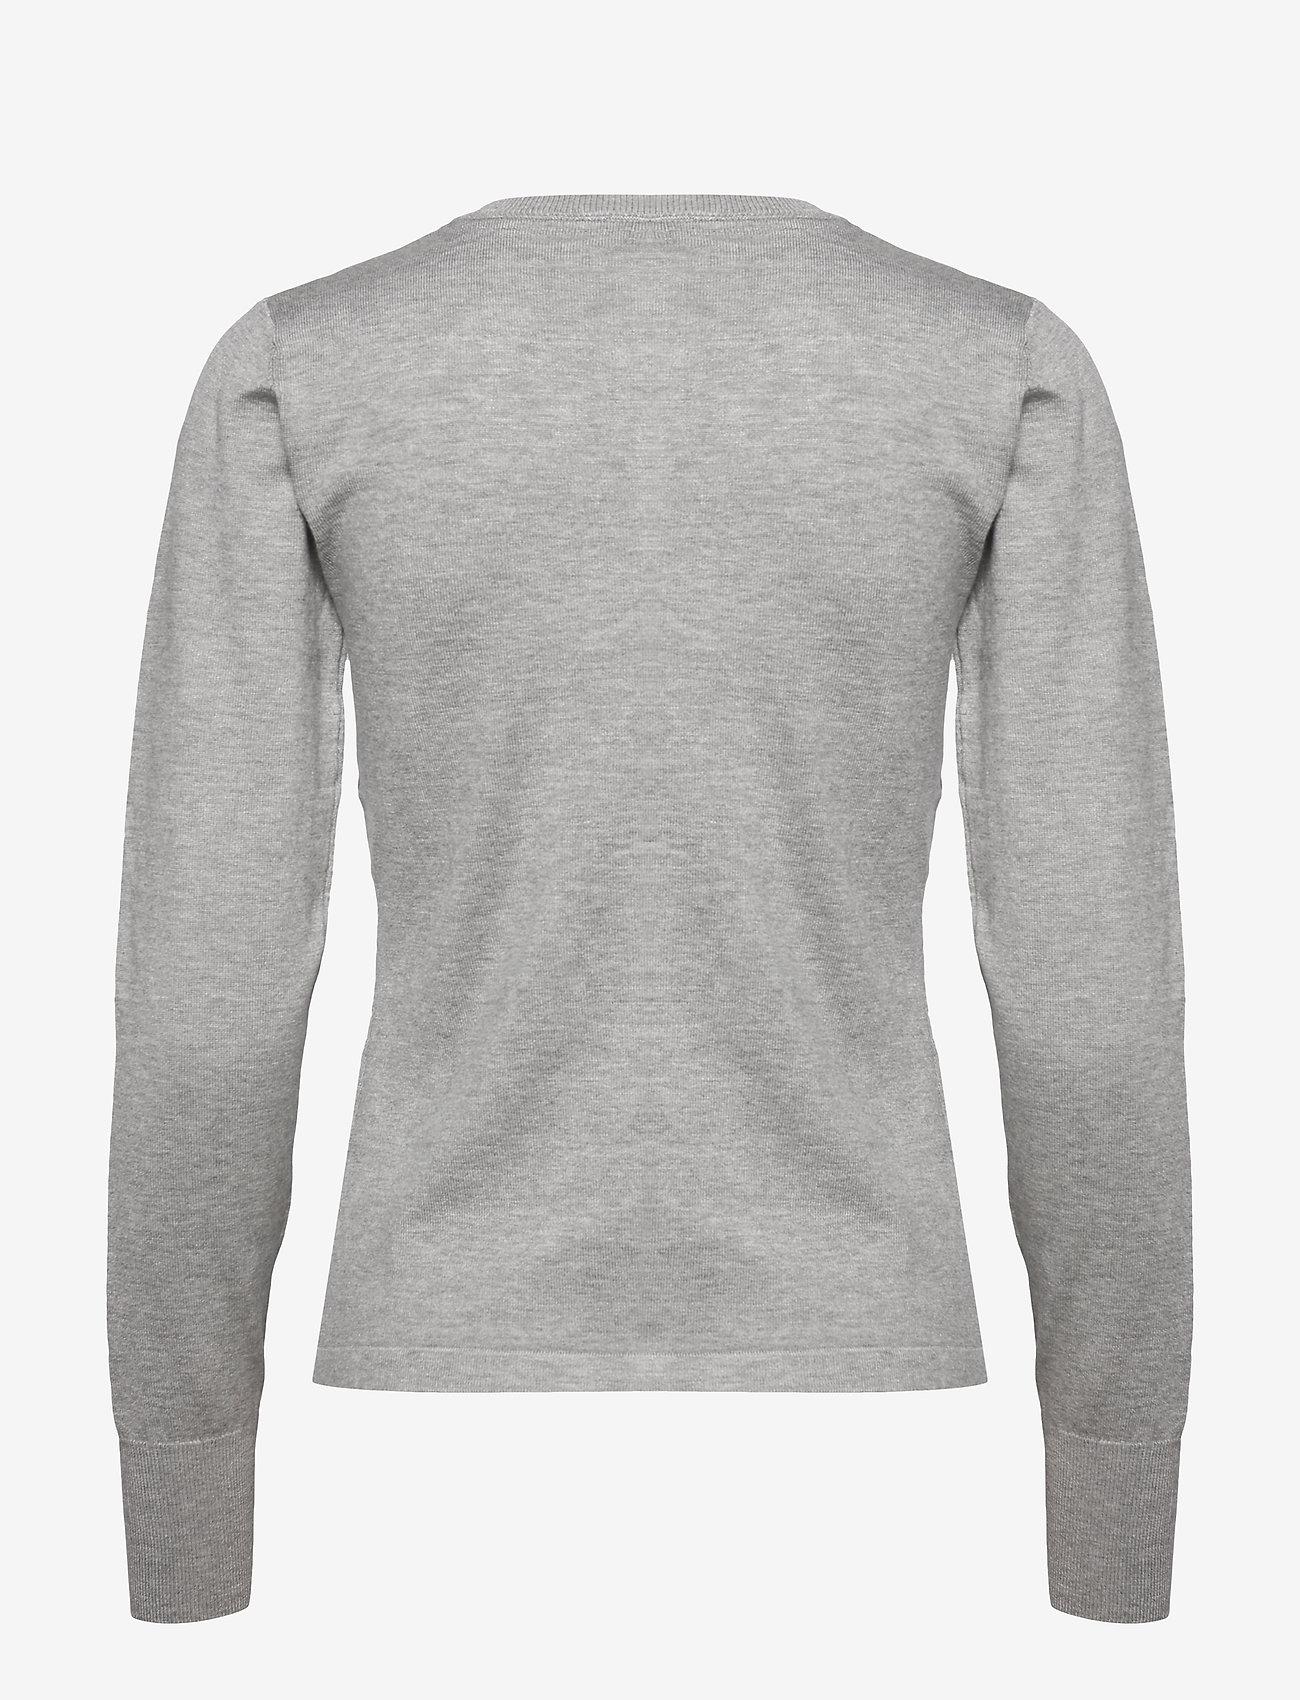 Pulz Jeans - PZSARA L/S Cardigan - cardigans - light grey melange - 1